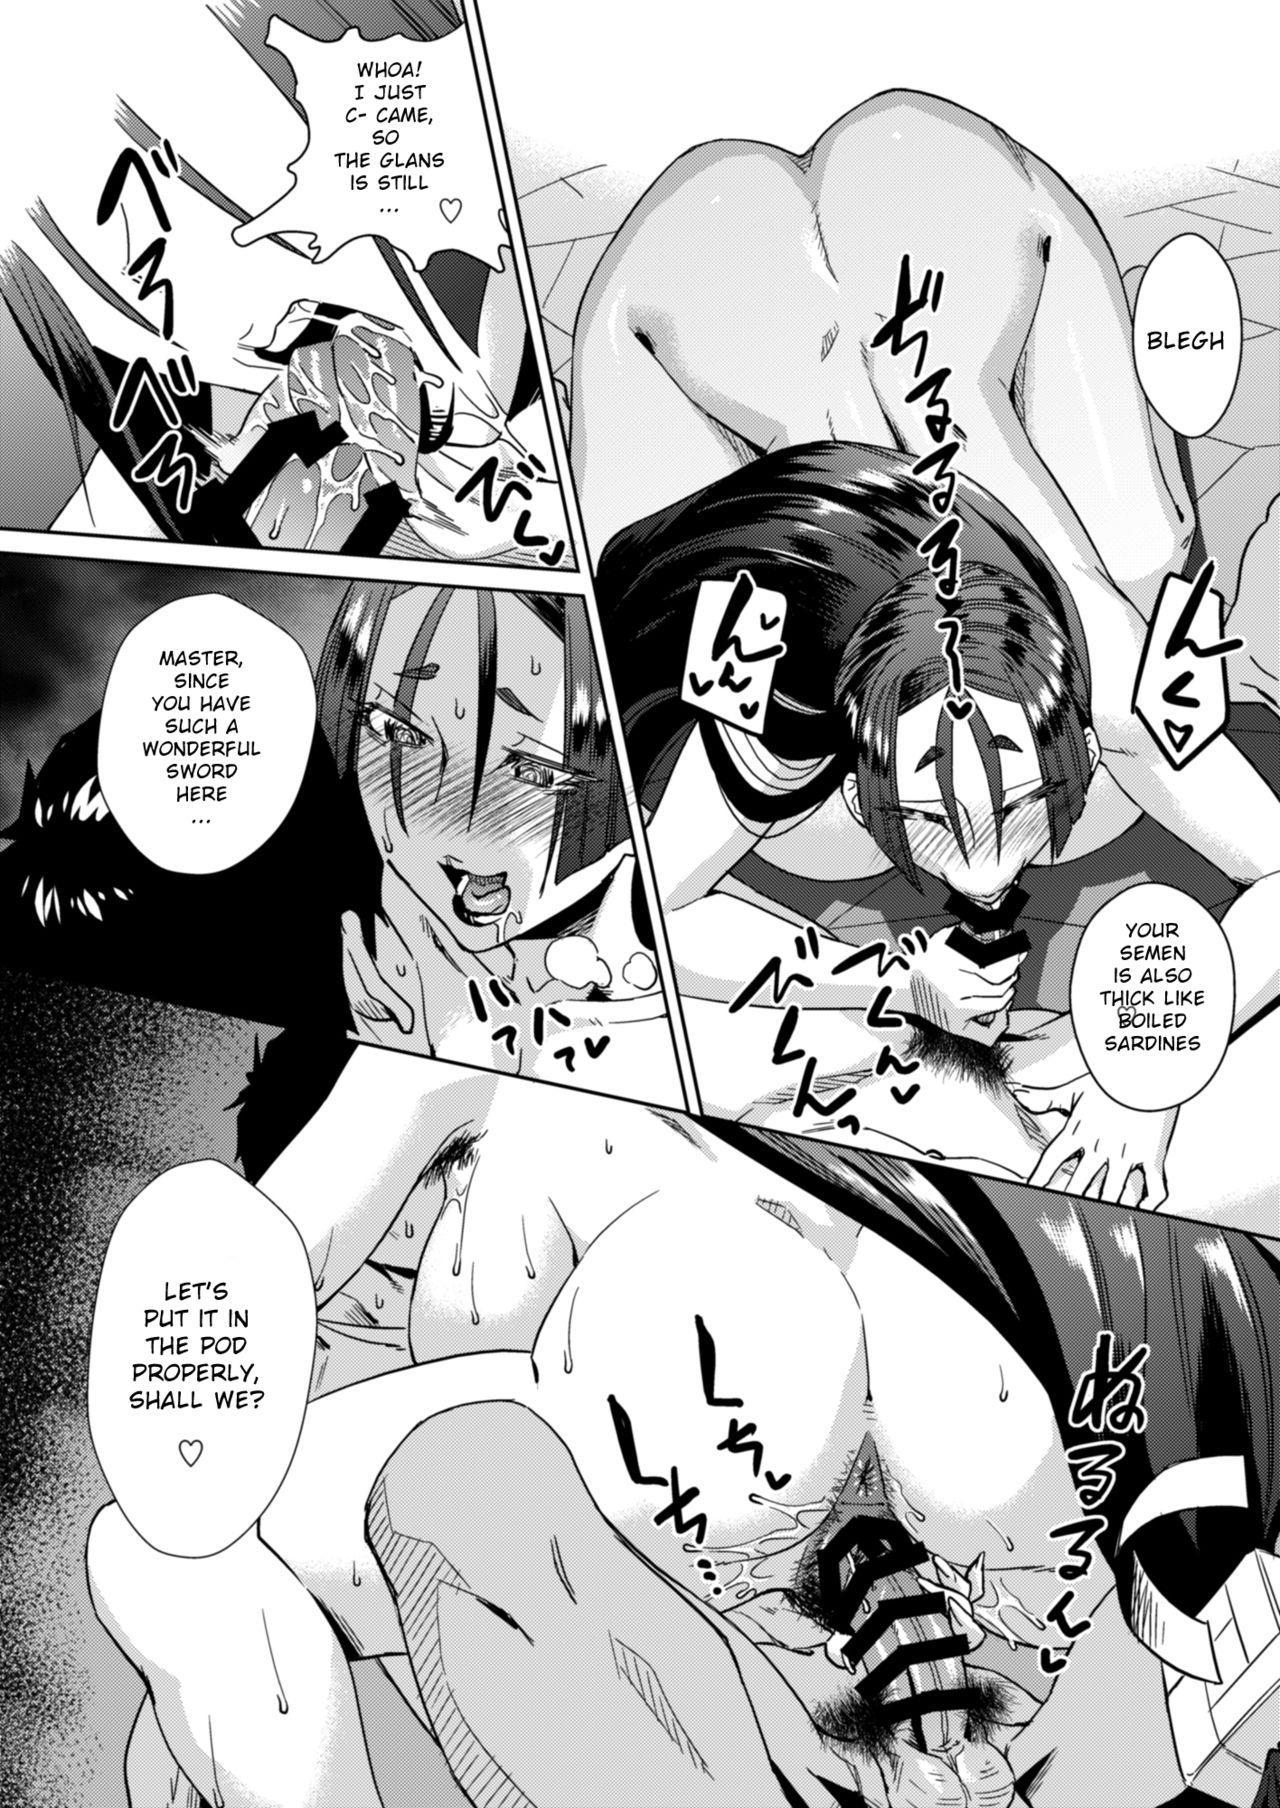 [Homerun Chaya (Abe Morioka)] Raikou (Mama) to Onsen Ecchi | Hot Spring Sex with Mama Raikou (Fate/Grand Order) [English] [Digital] 16